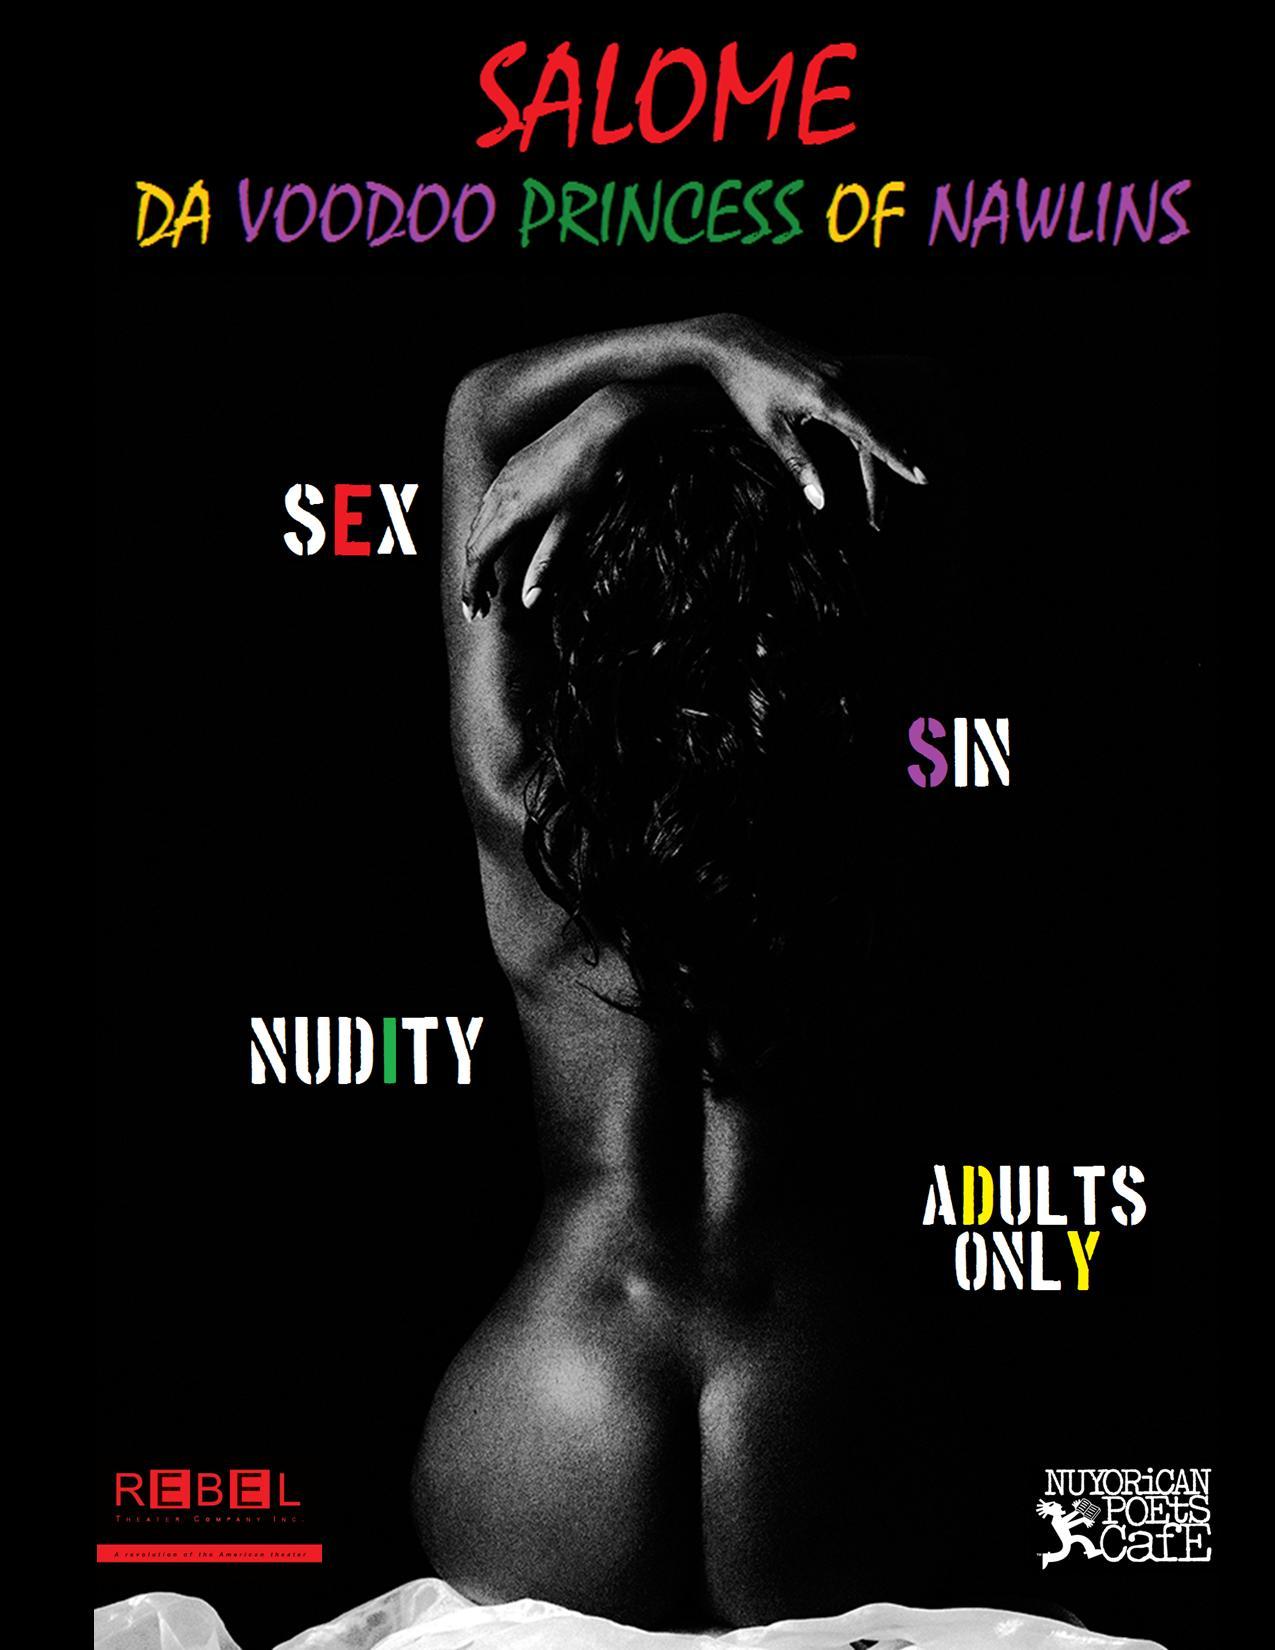 Salome: Da Voodoo Princess of N'Awlins opens at the Nuyorican